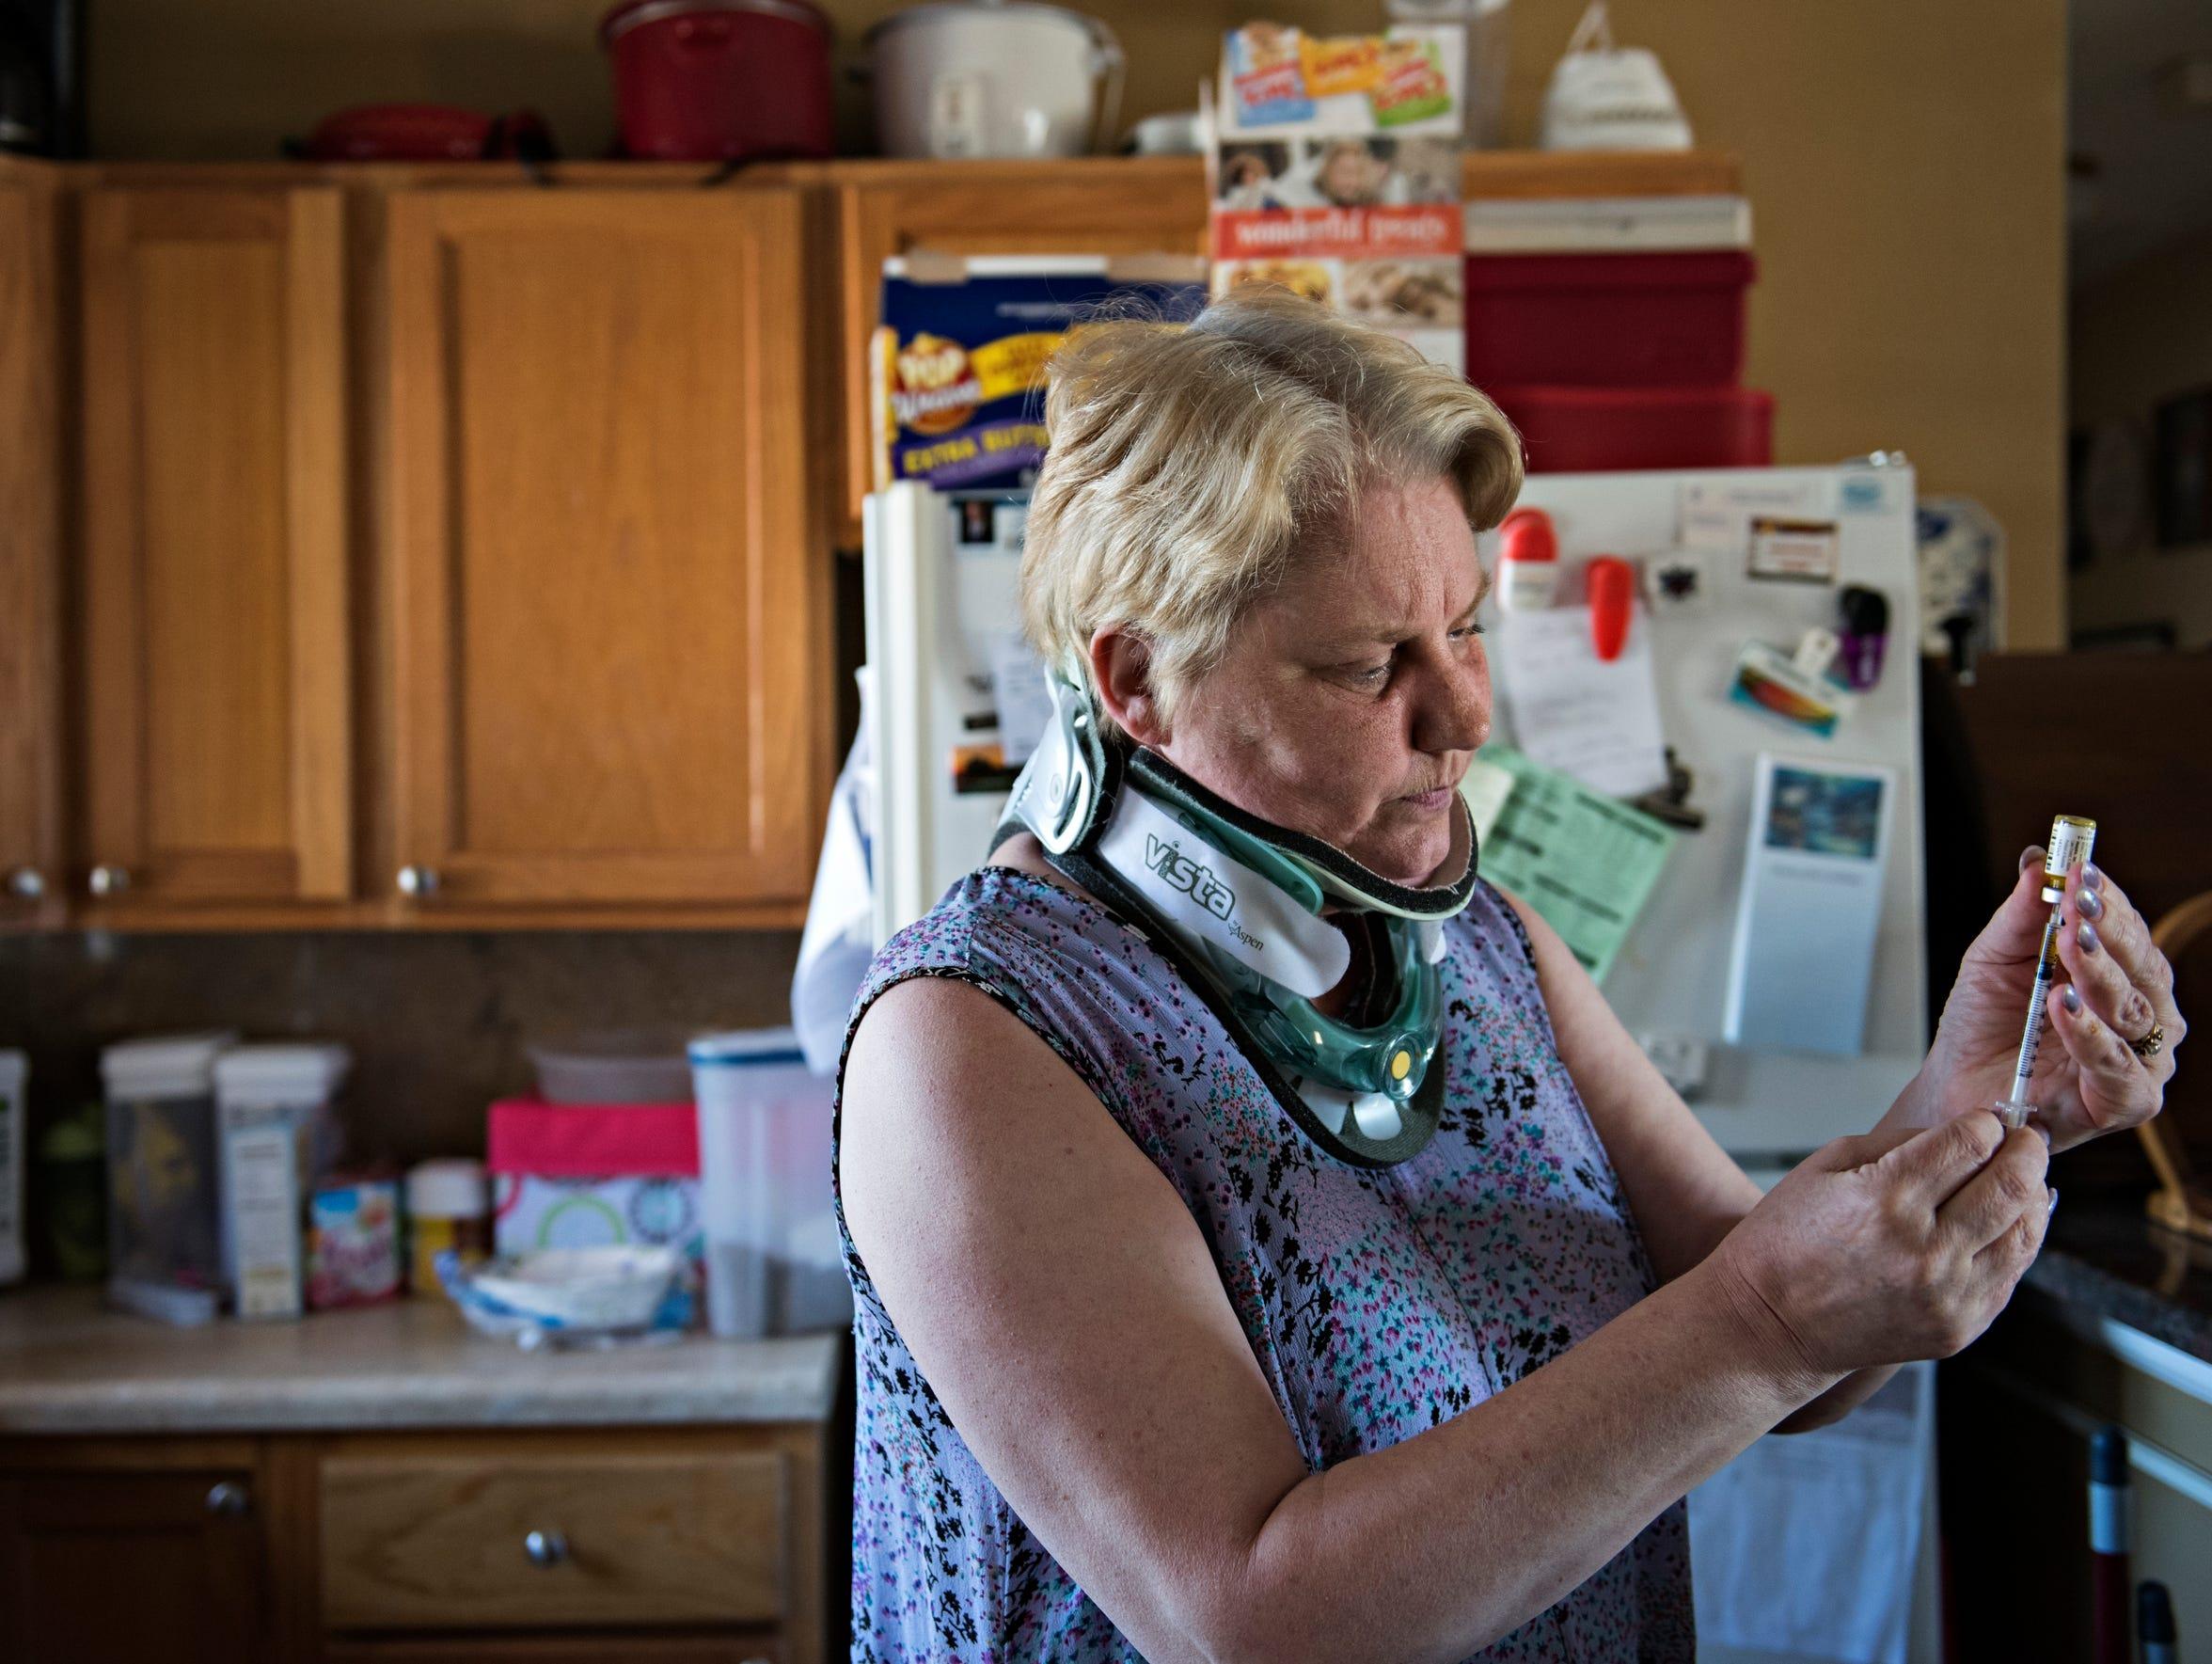 LaRita Jacobs has severe arthritis and delayed a neck